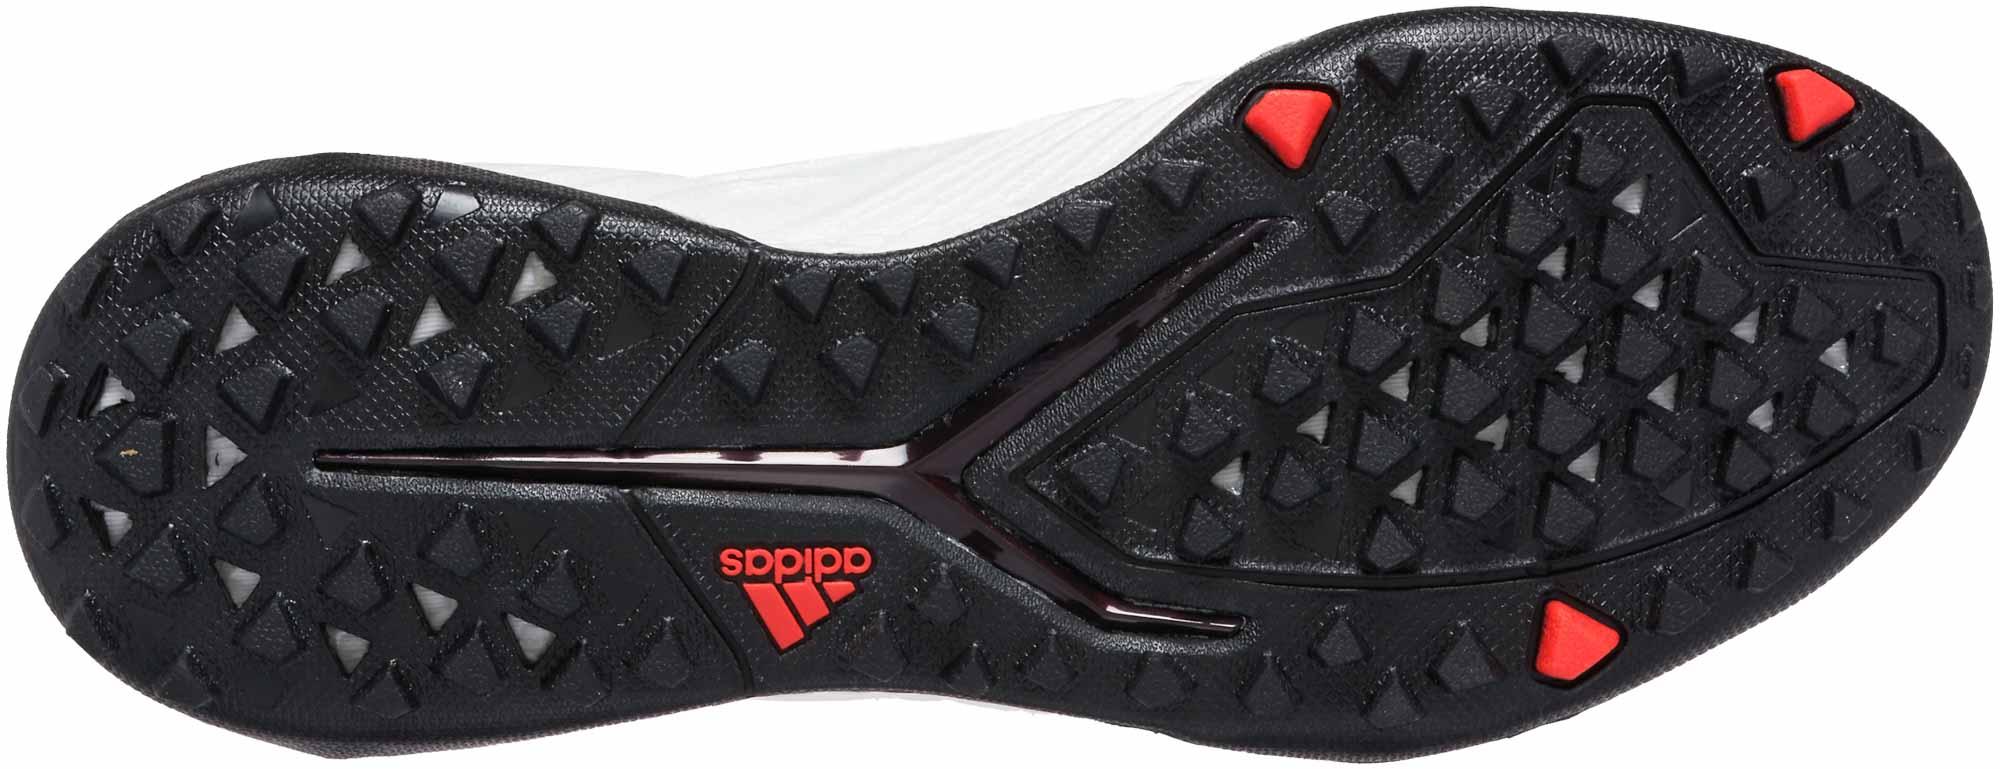 6ed00907161f ... discount adidas predator tango f5712 27808 cheap adidas predator 18.1  fg black white ...